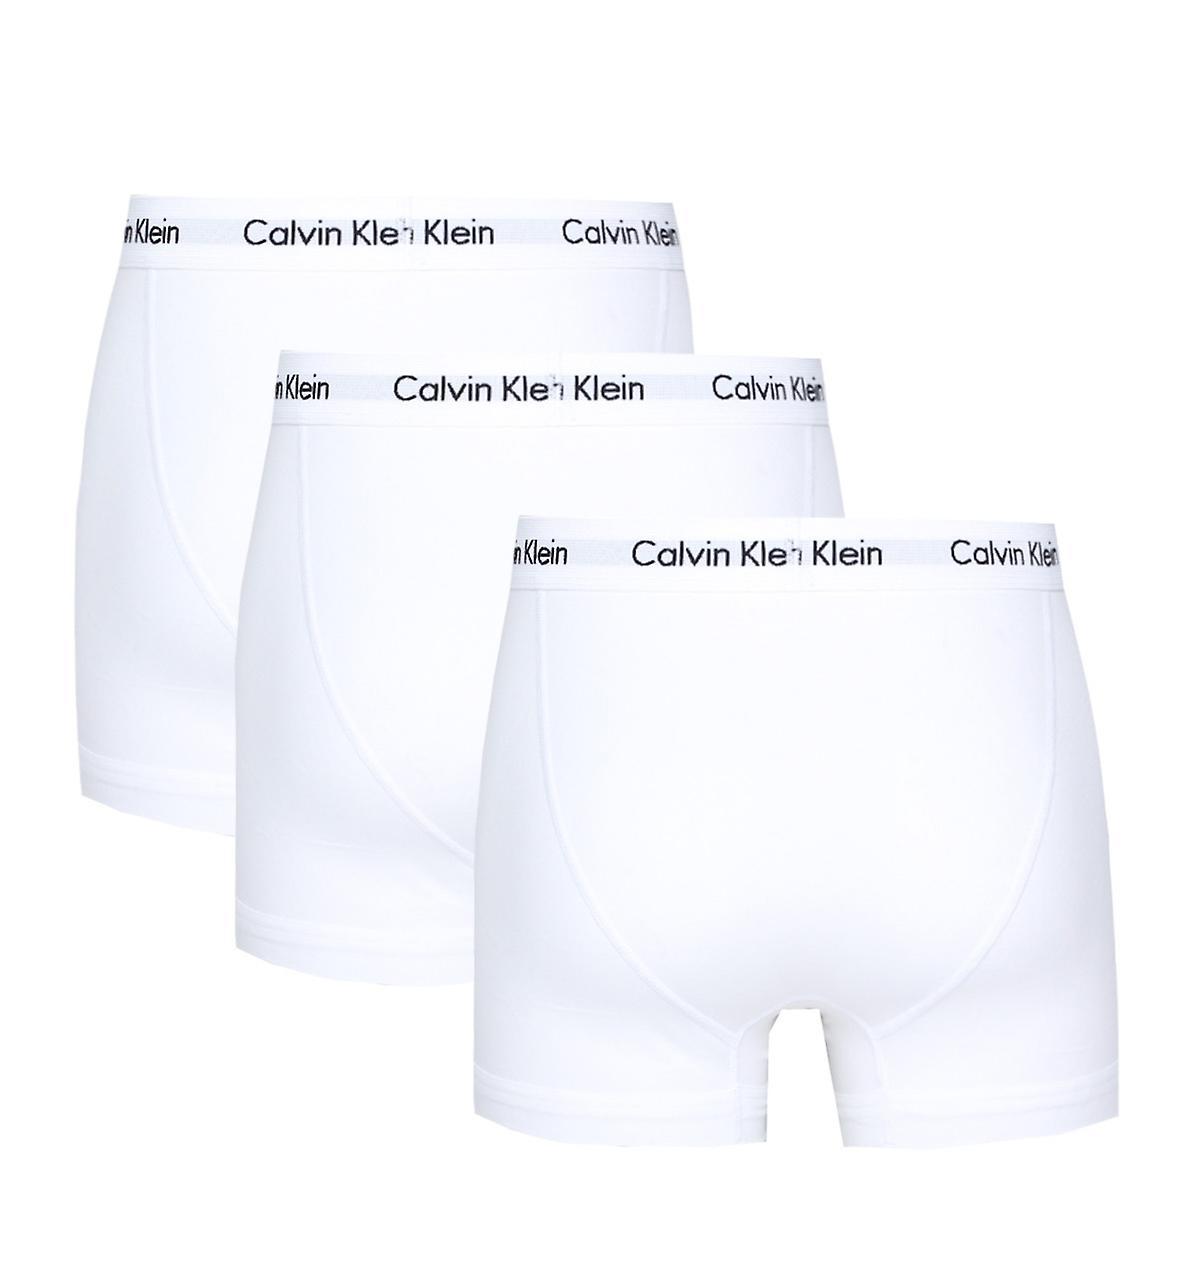 Calvin Klein 3 Pack White Cotton Stretch Trunks